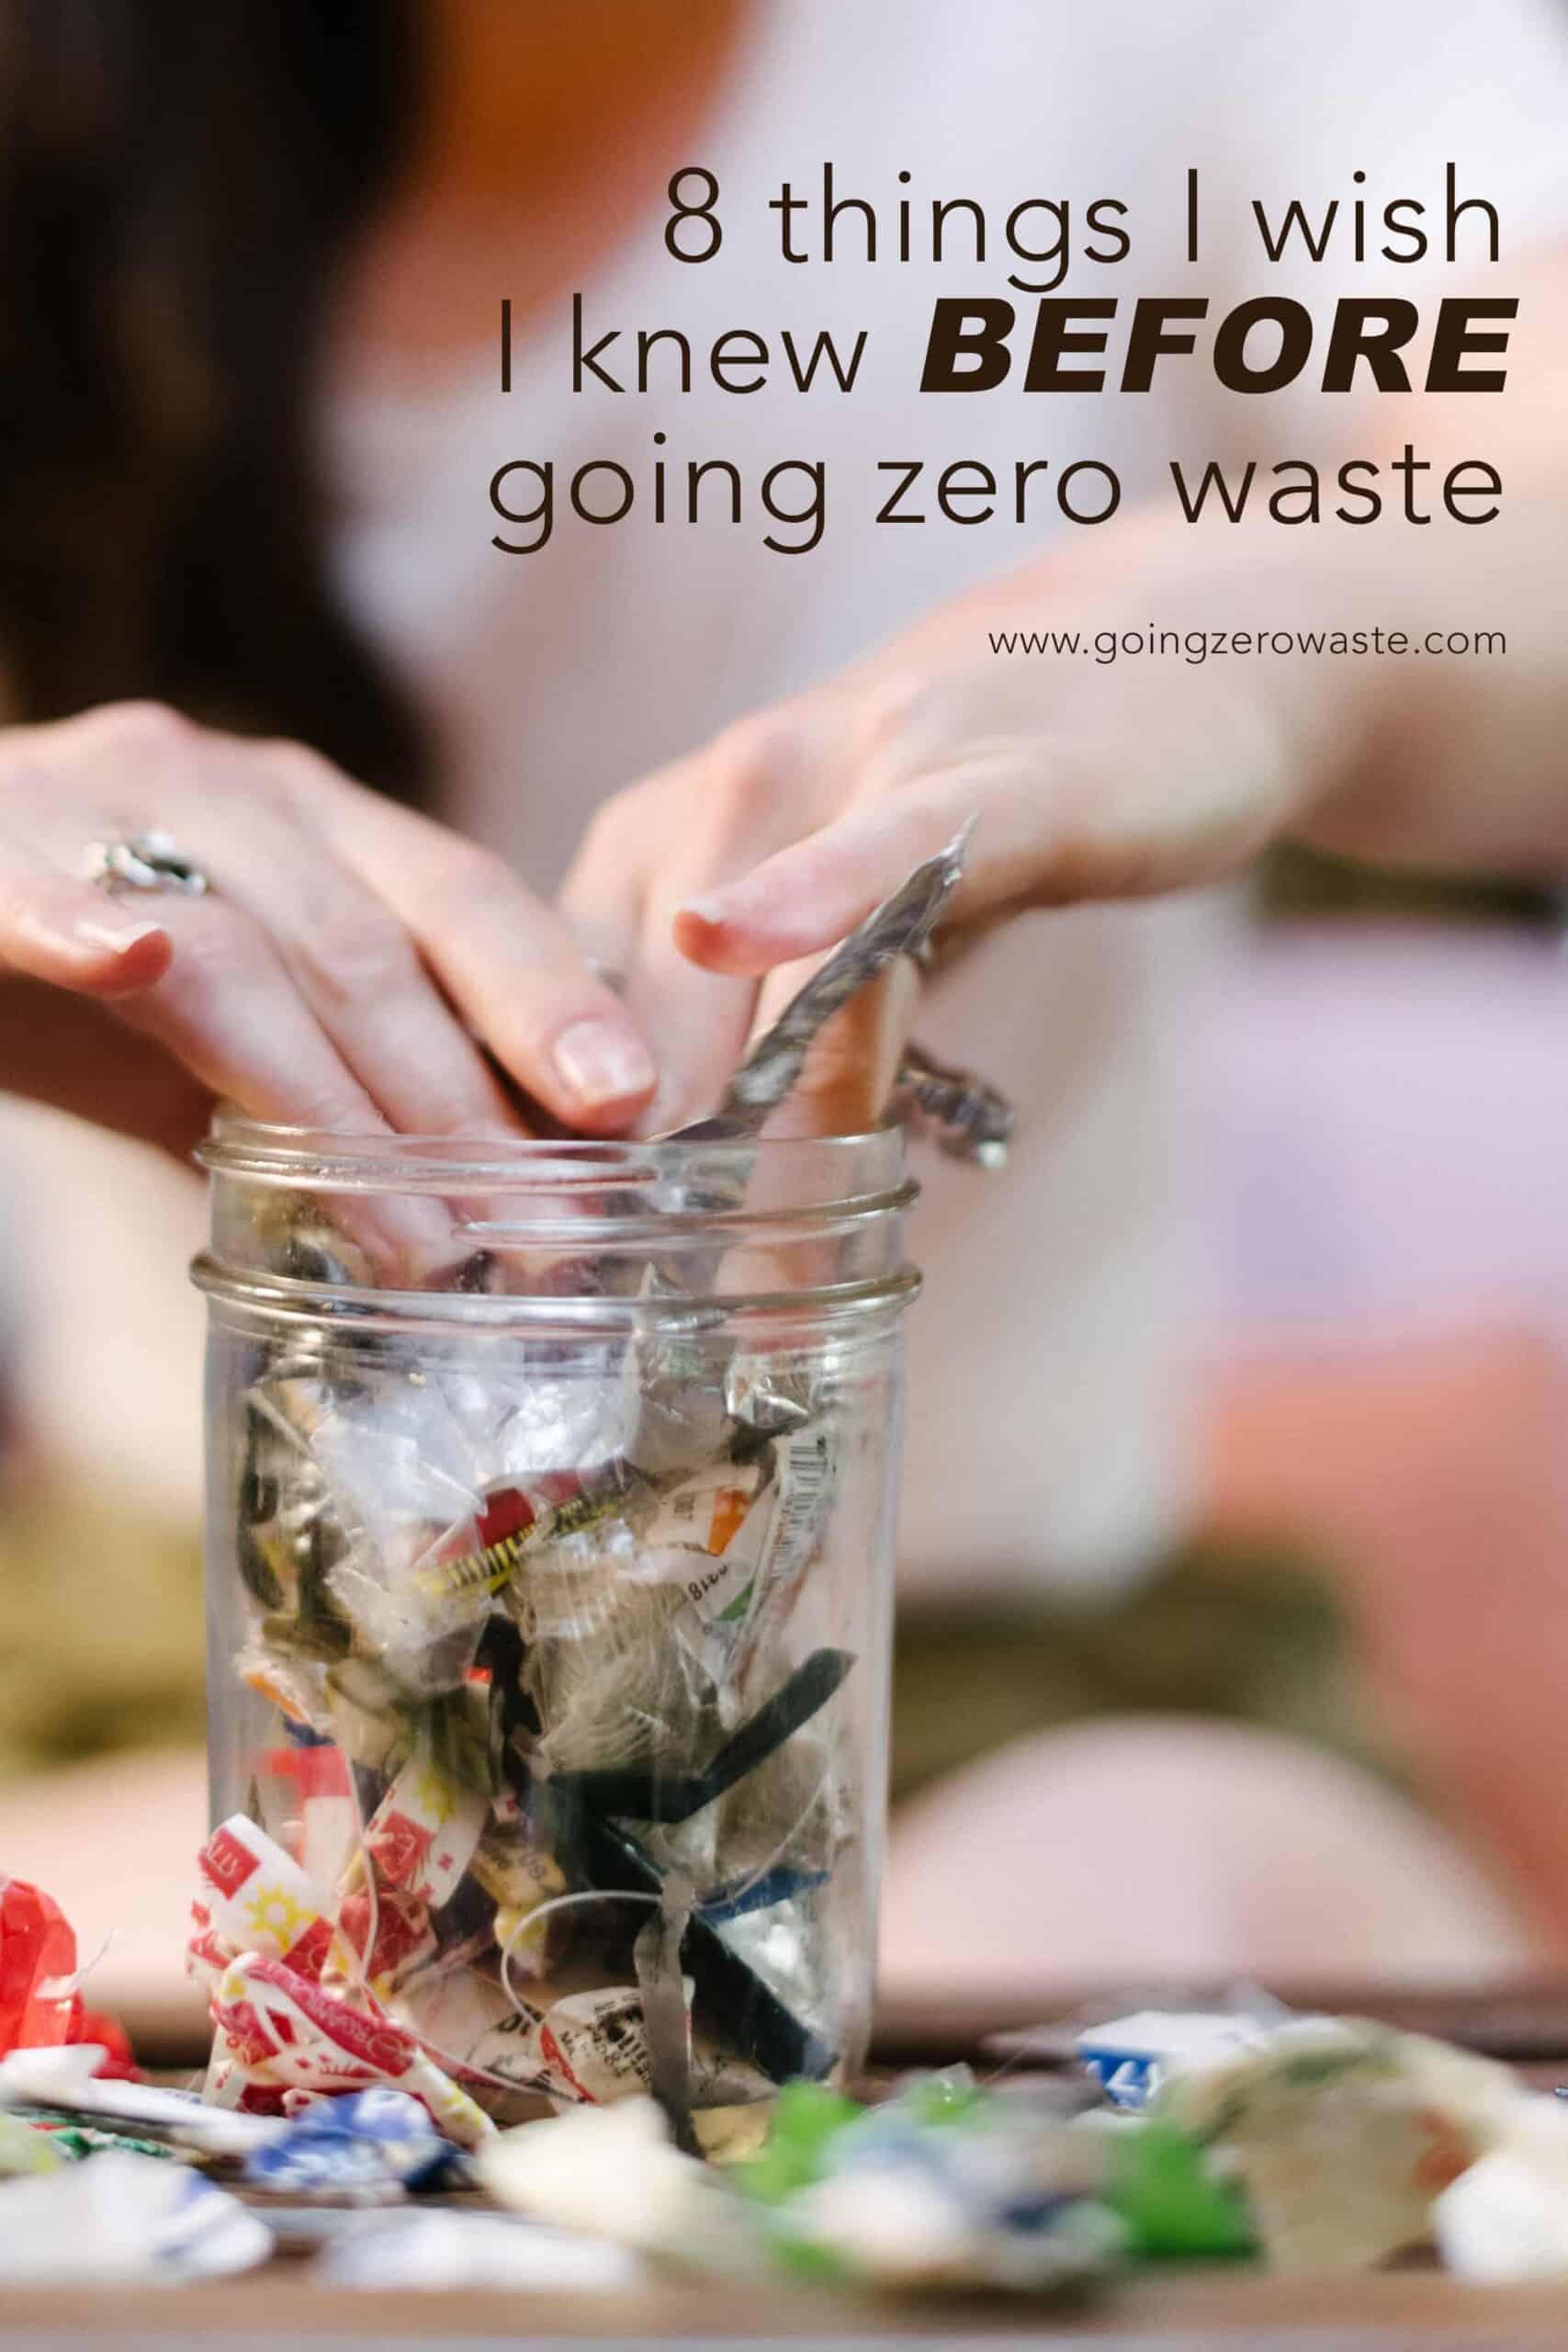 8 Things I Wish I Knew BEFORE Going Zero Waste